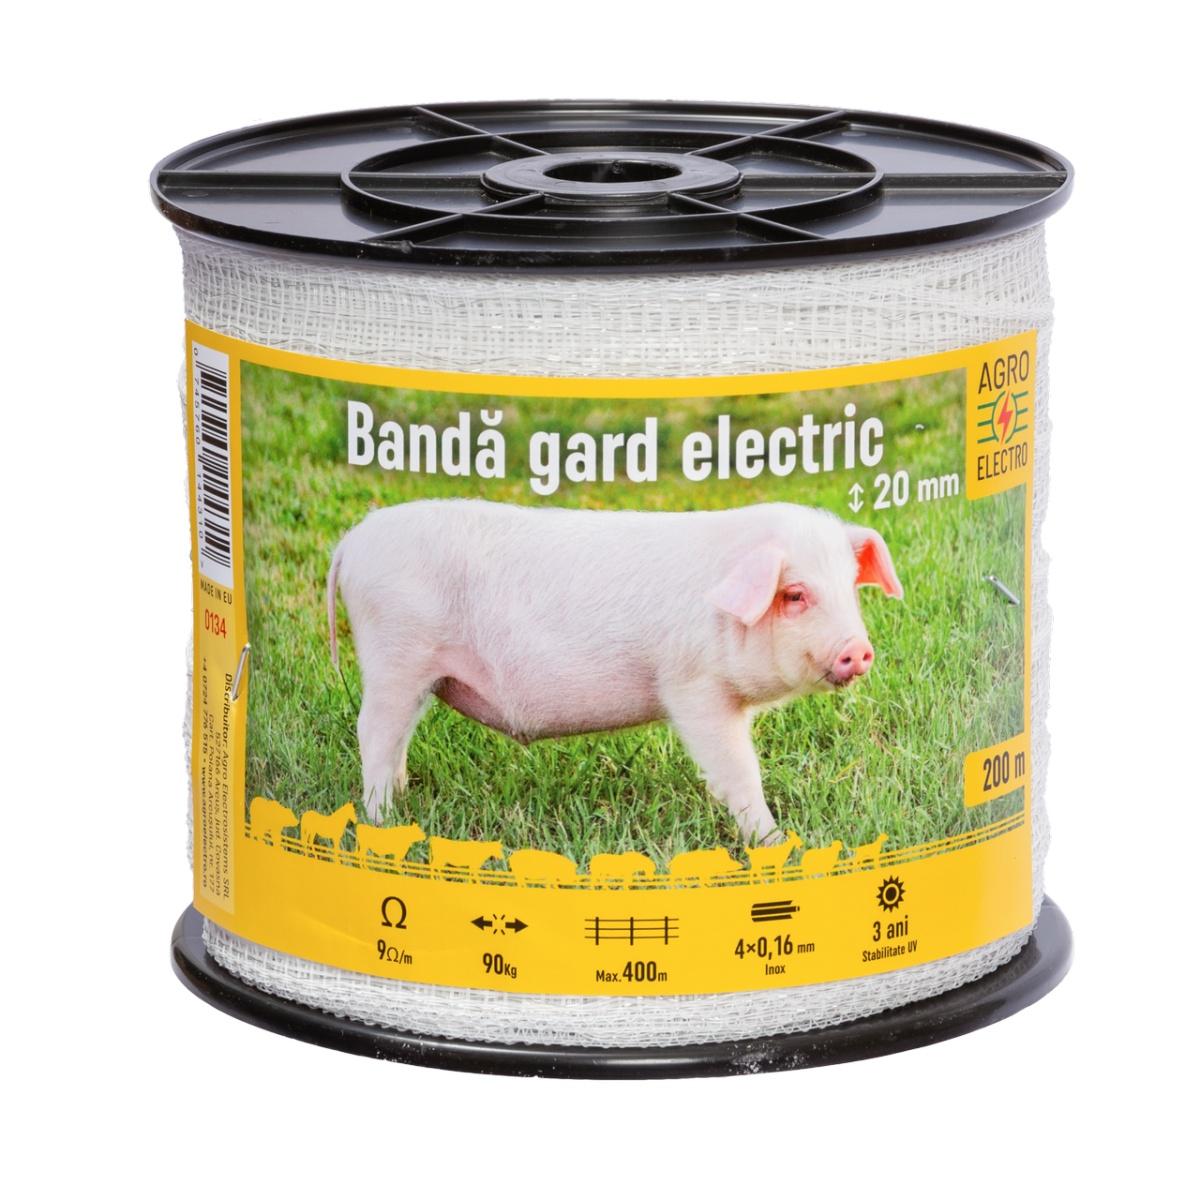 Bandă gard electric - 20mm - 200m - 90kg - 9Ω/m